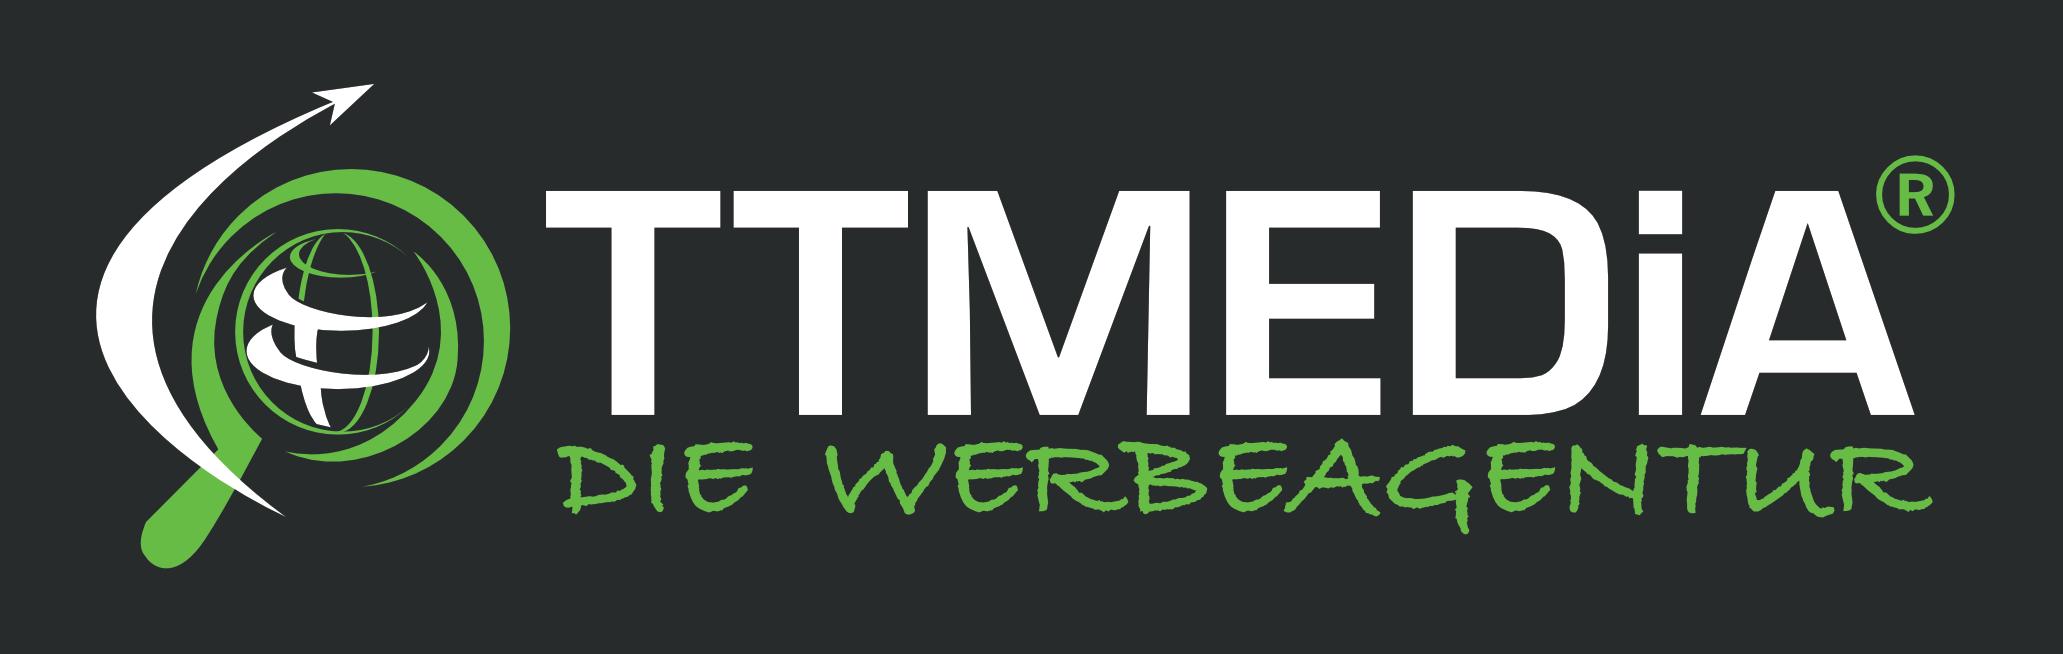 TTMEDiA® Die Werbeagentur